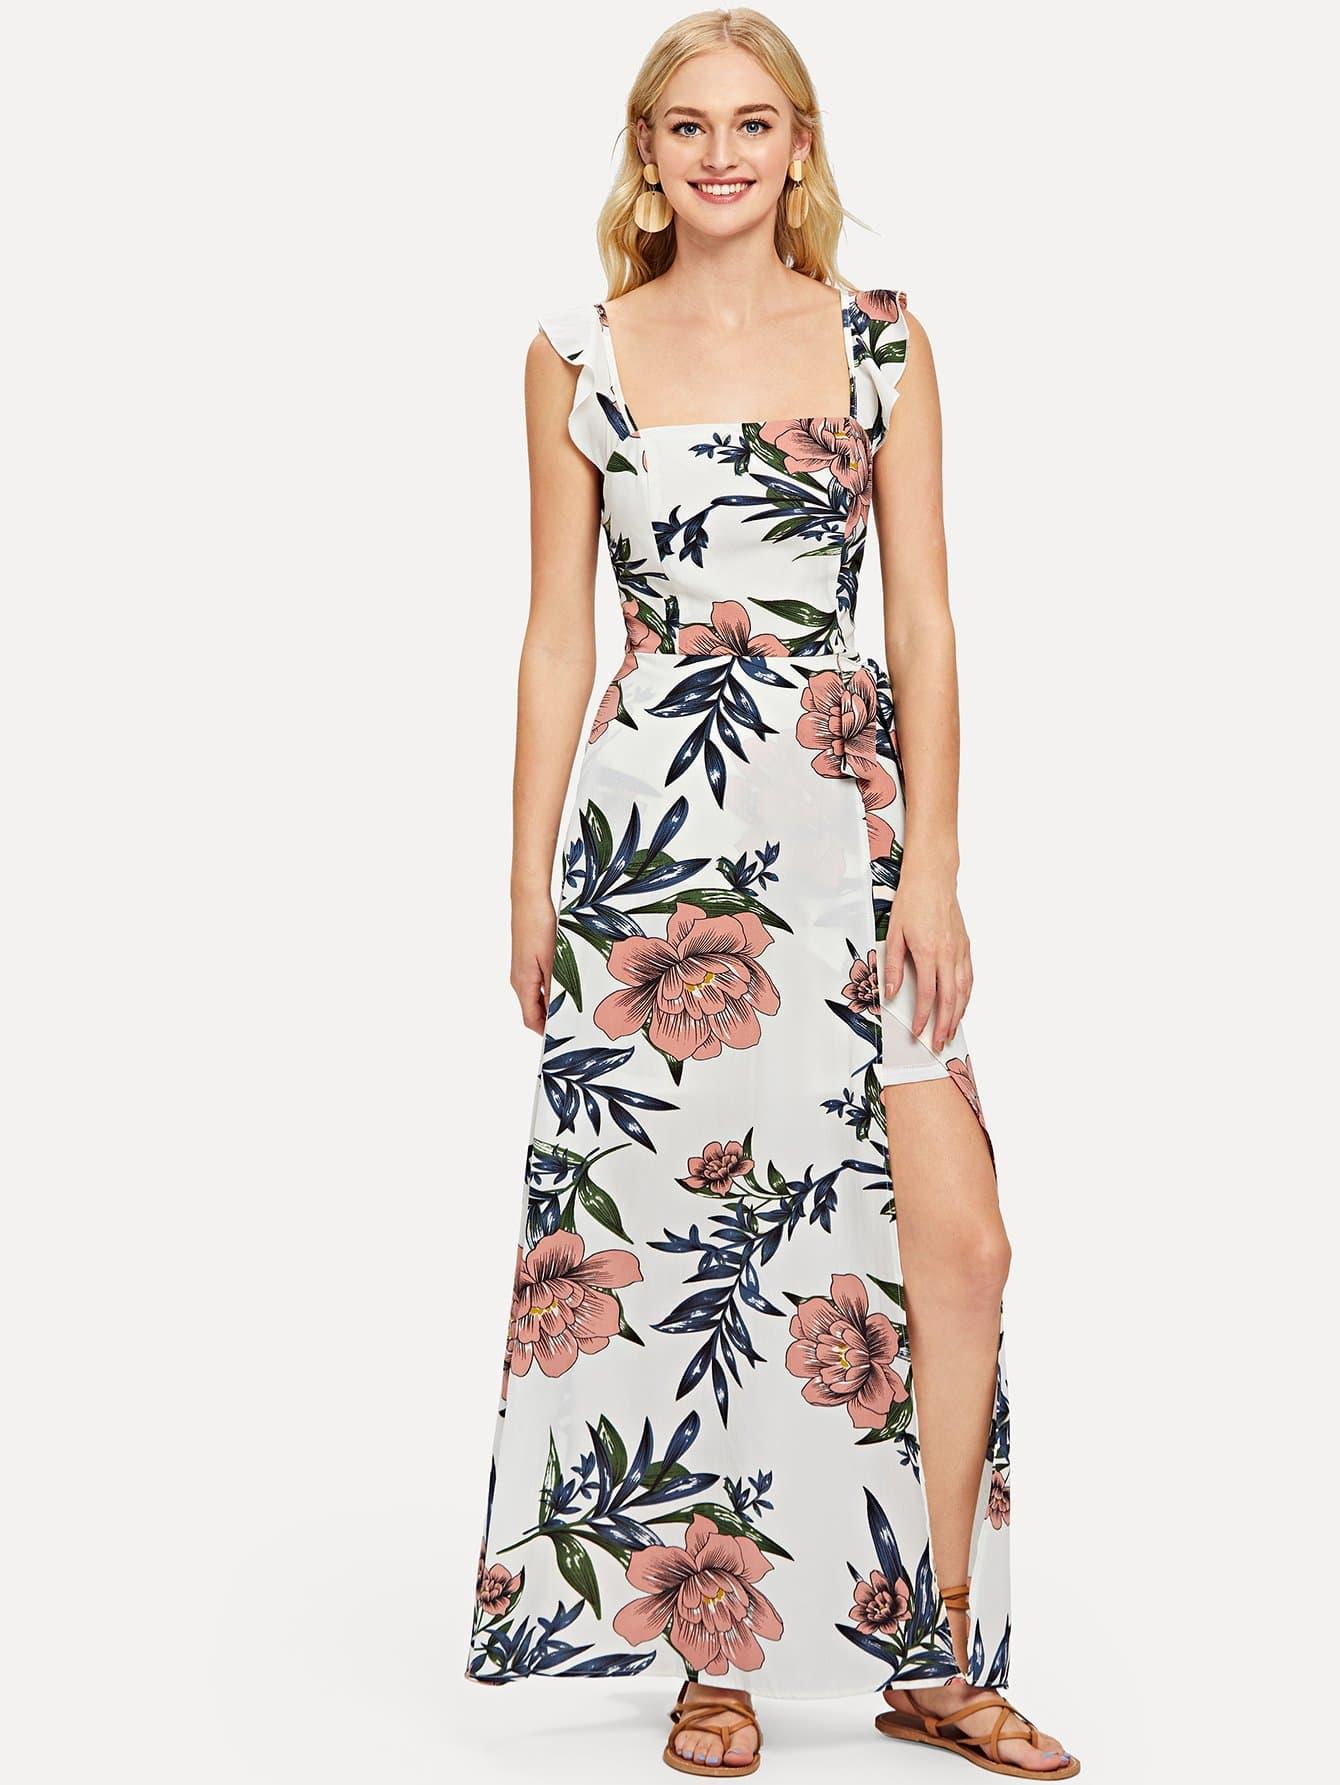 Botanical Print Overlap Slit Hem Ruffle Dress ruffle trim overlap hem dress